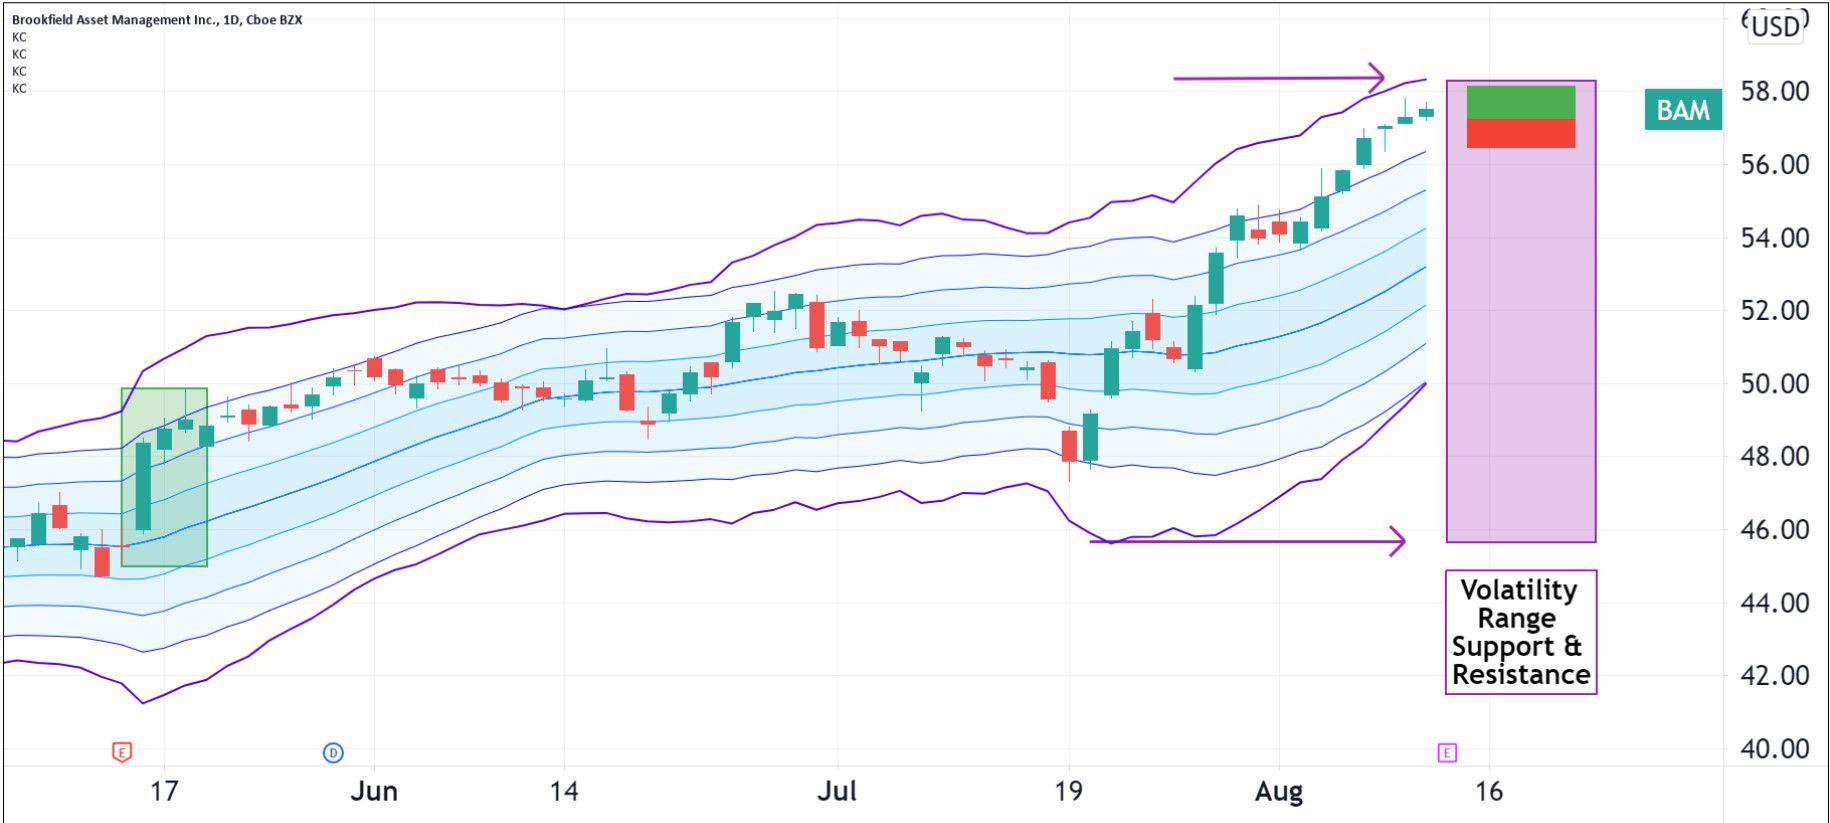 Volatility pattern for Brookfield Asset Management Inc. (BAM)